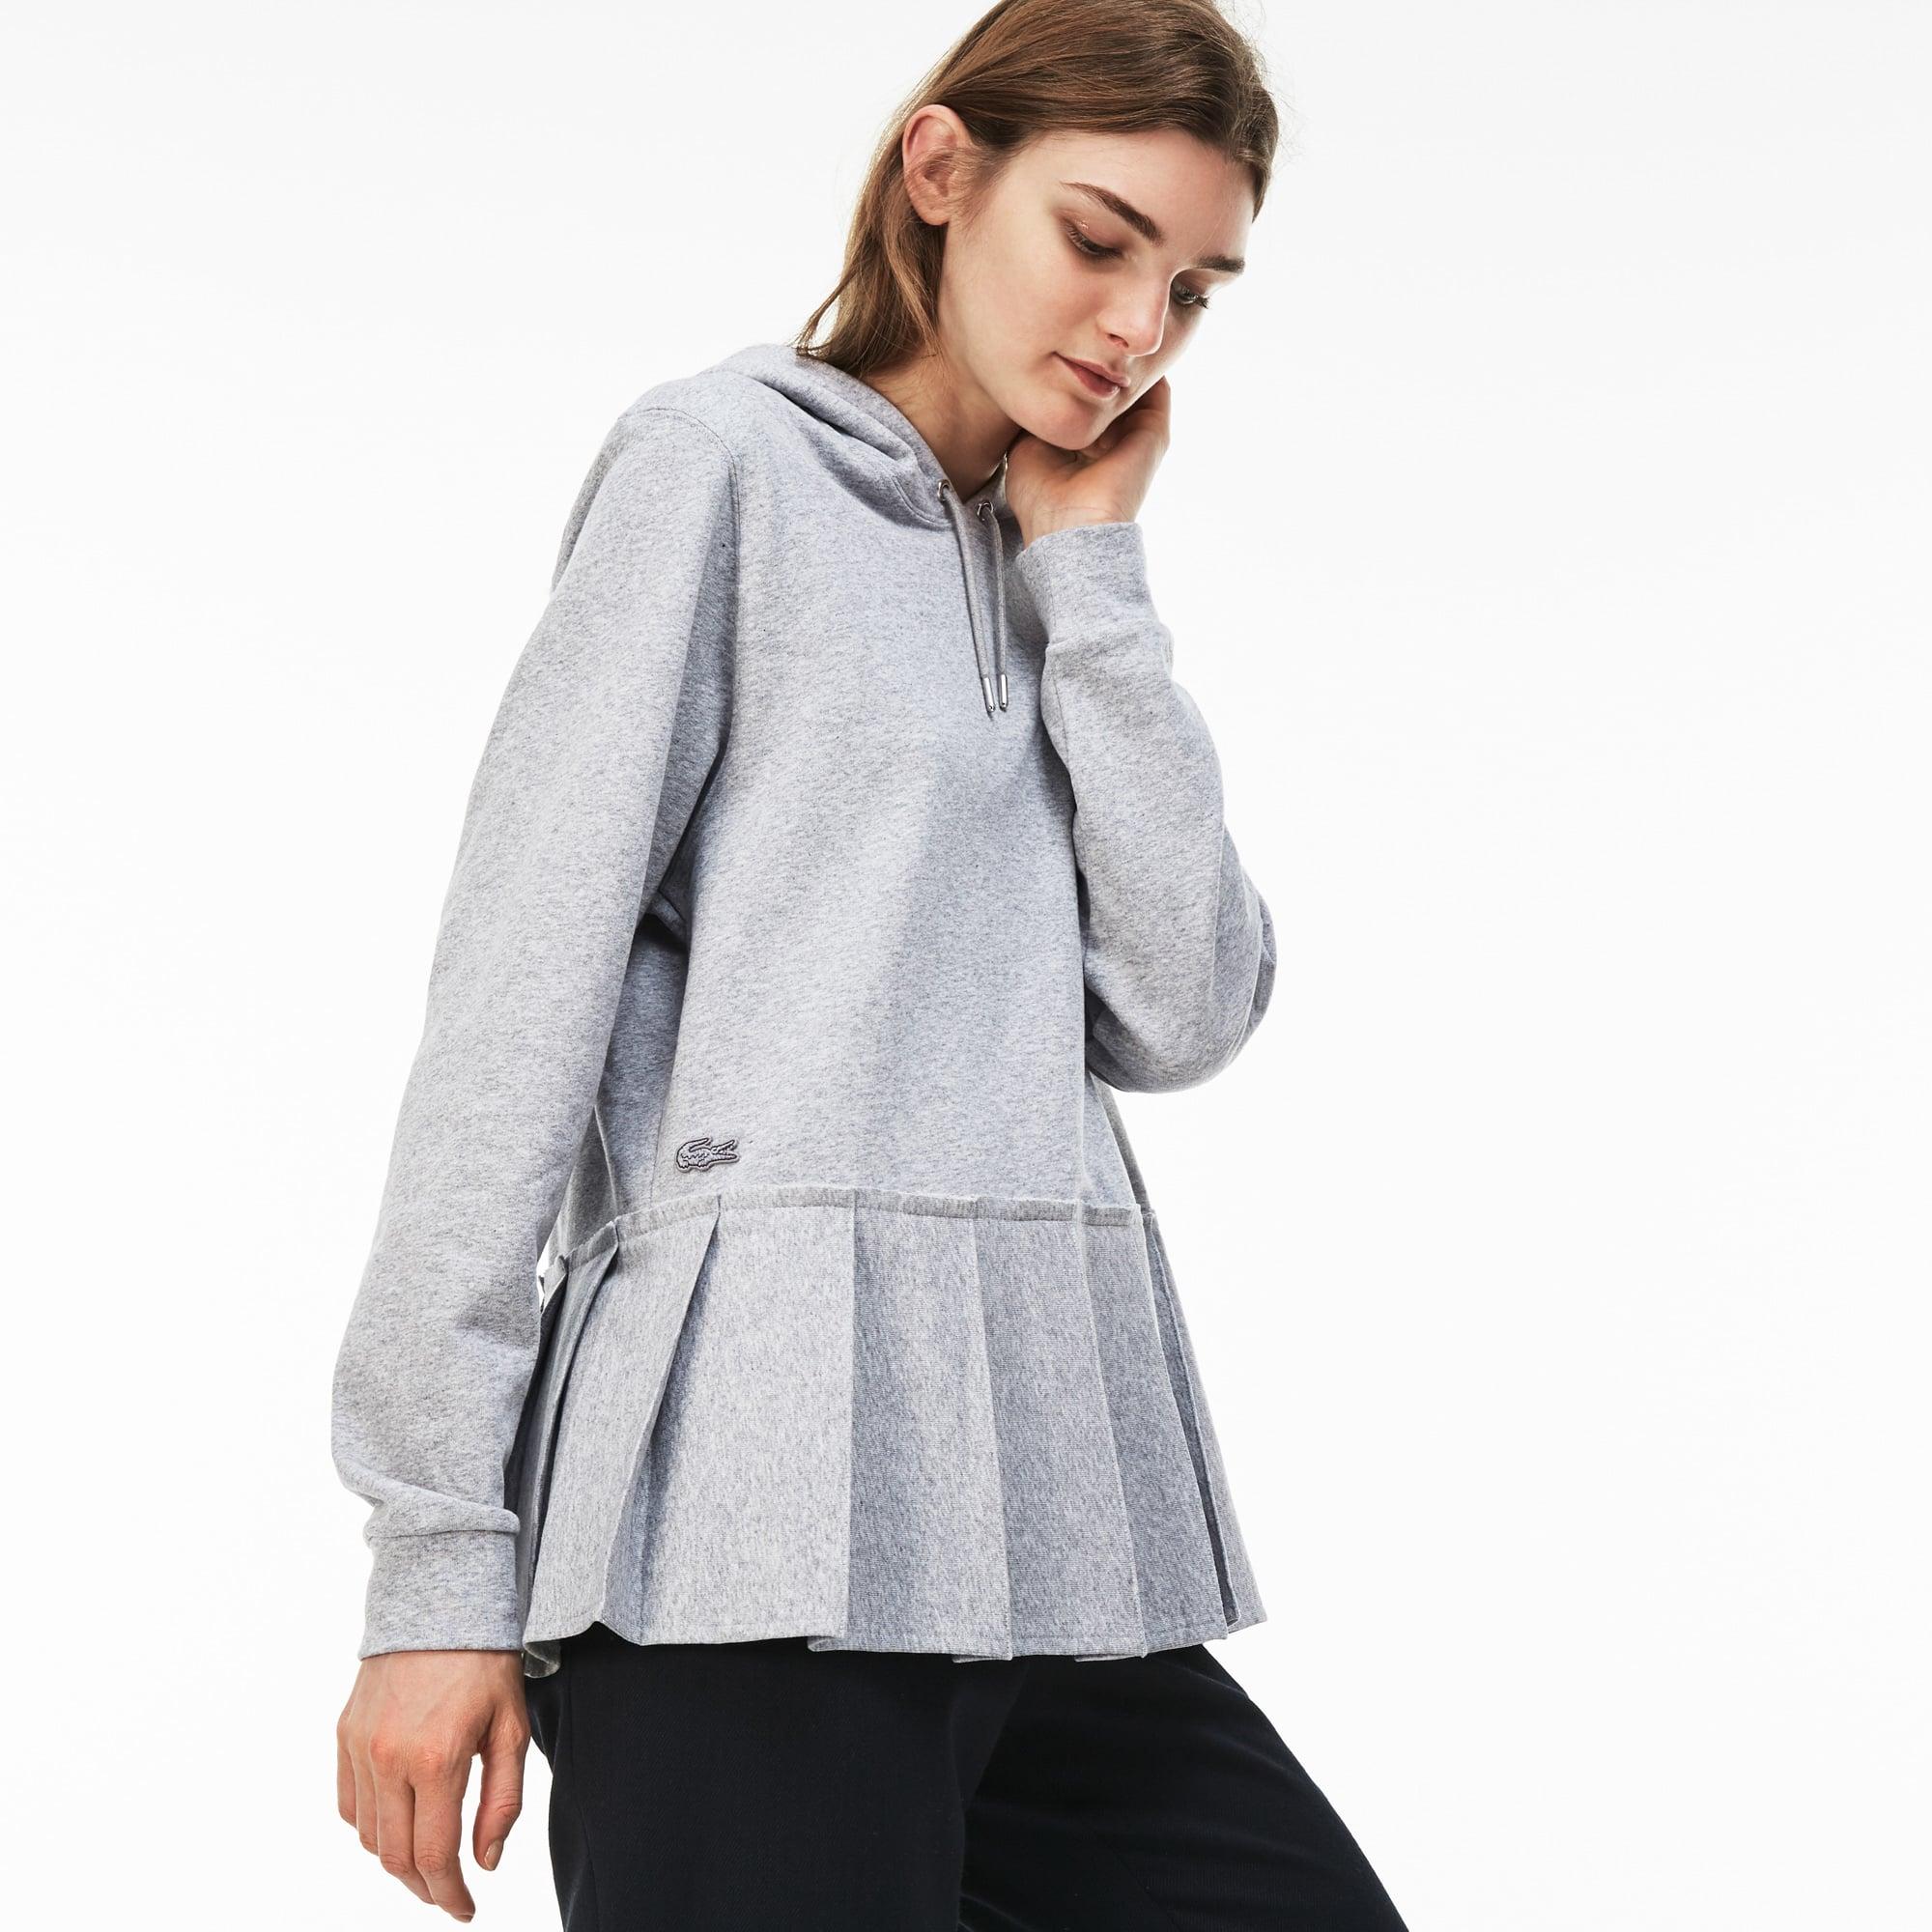 Women's Hooded Pleated Fleece Sweatshirt